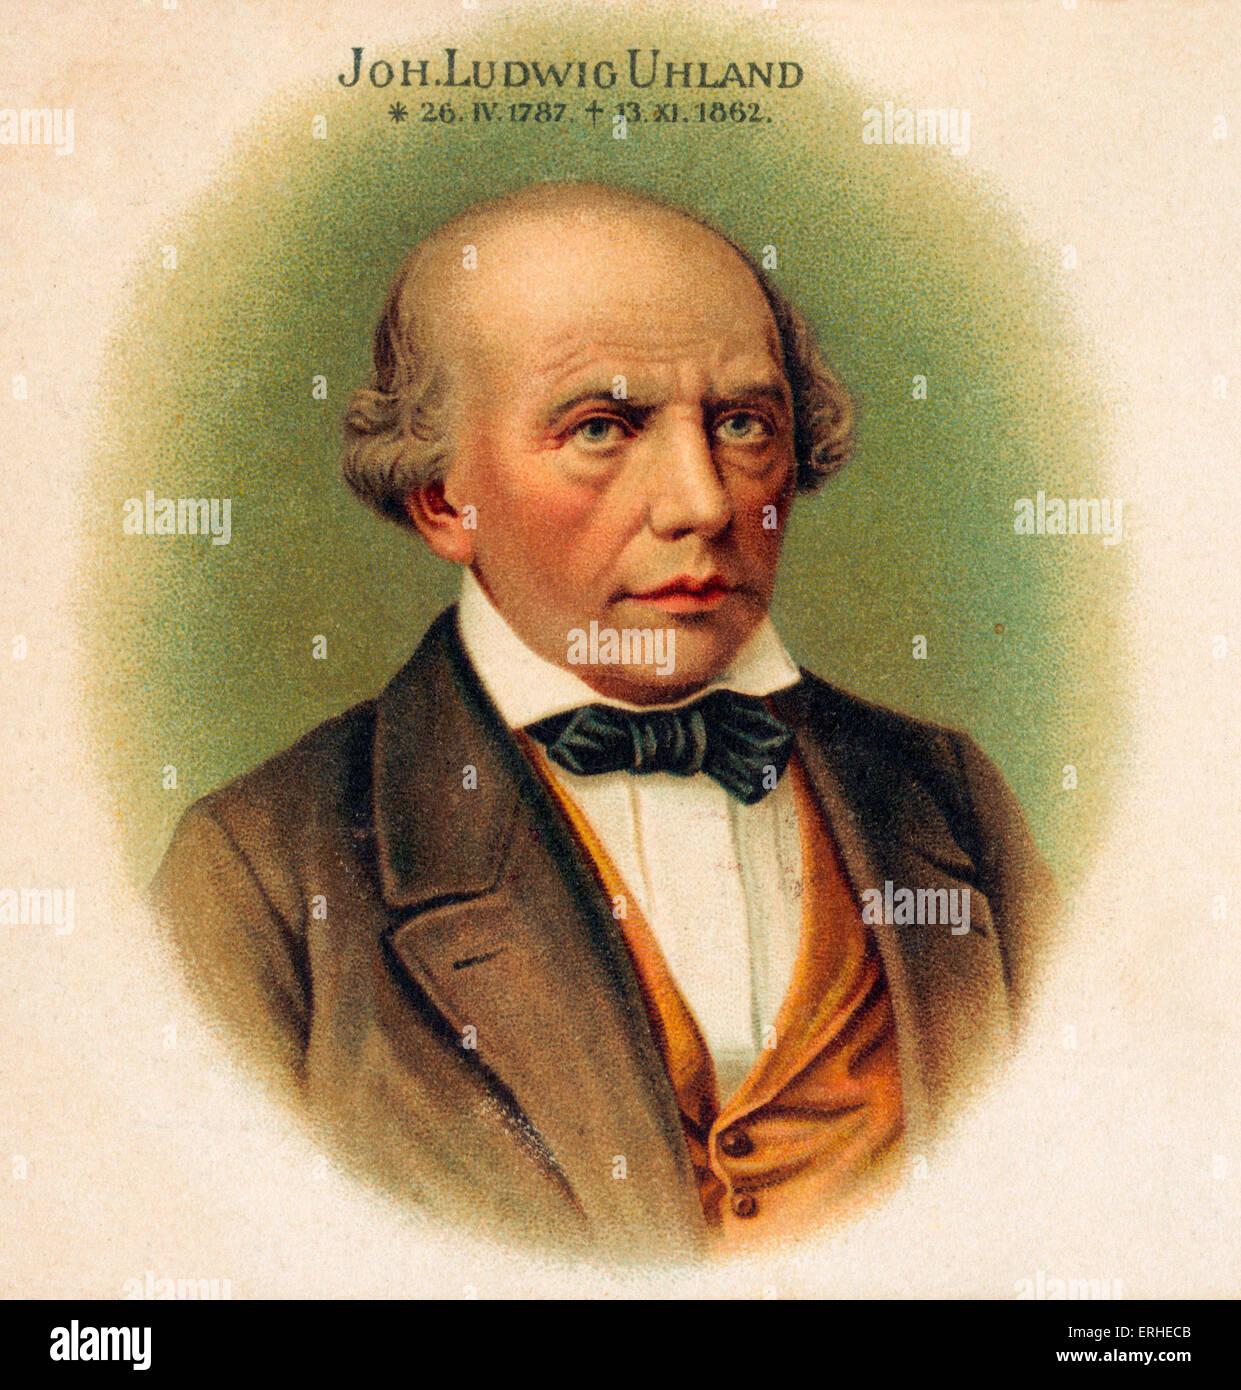 Johann Ludwig Uhland - German lyric poet and leader of the Swabian school 1787-1862 - Stock Image